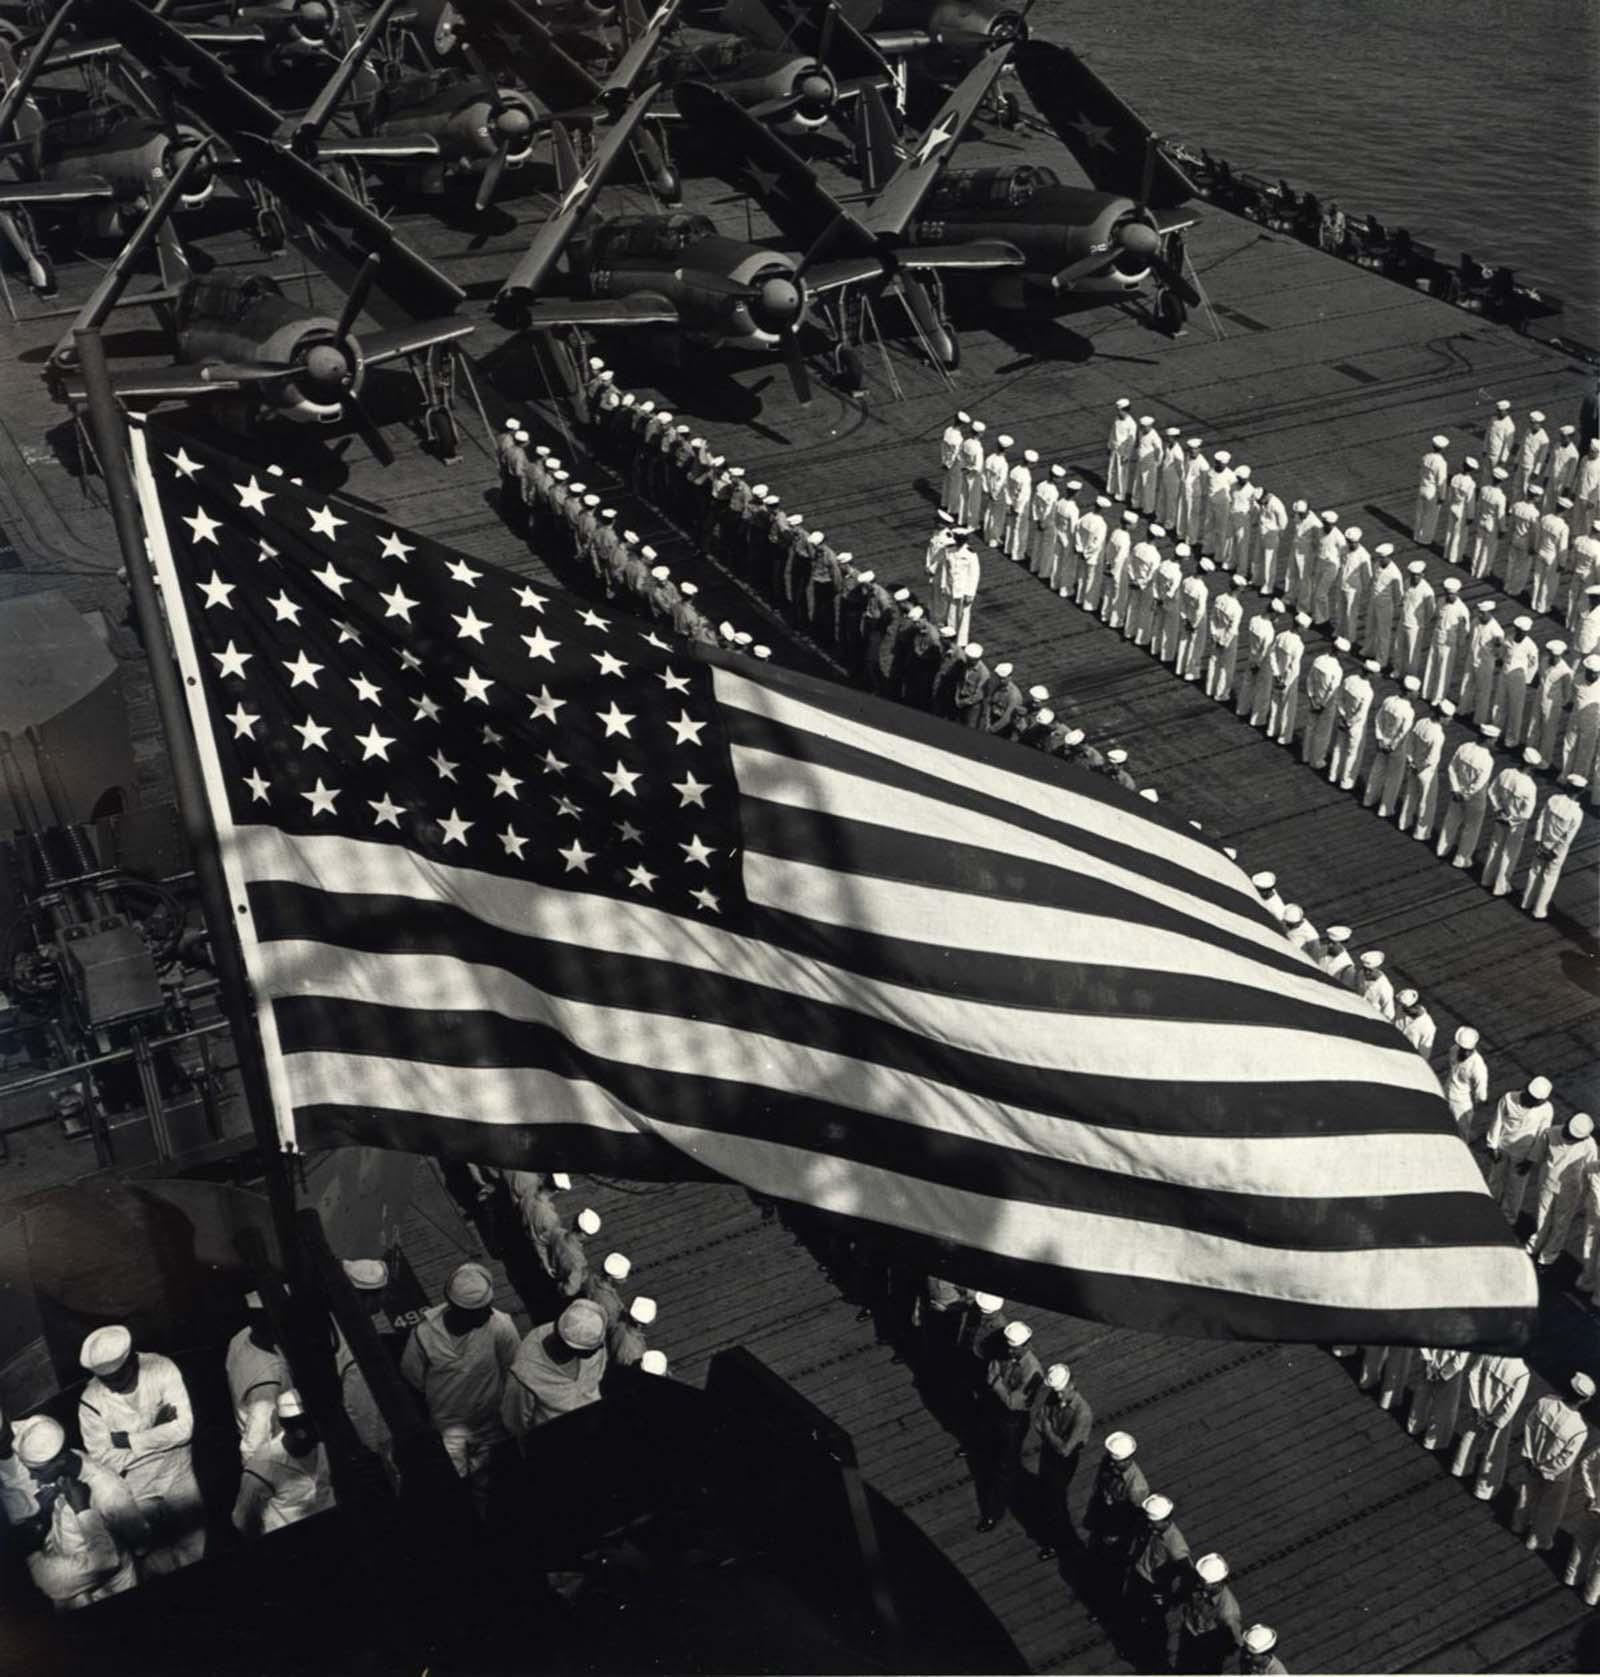 U.S. Navy under American flag, c. 1943.